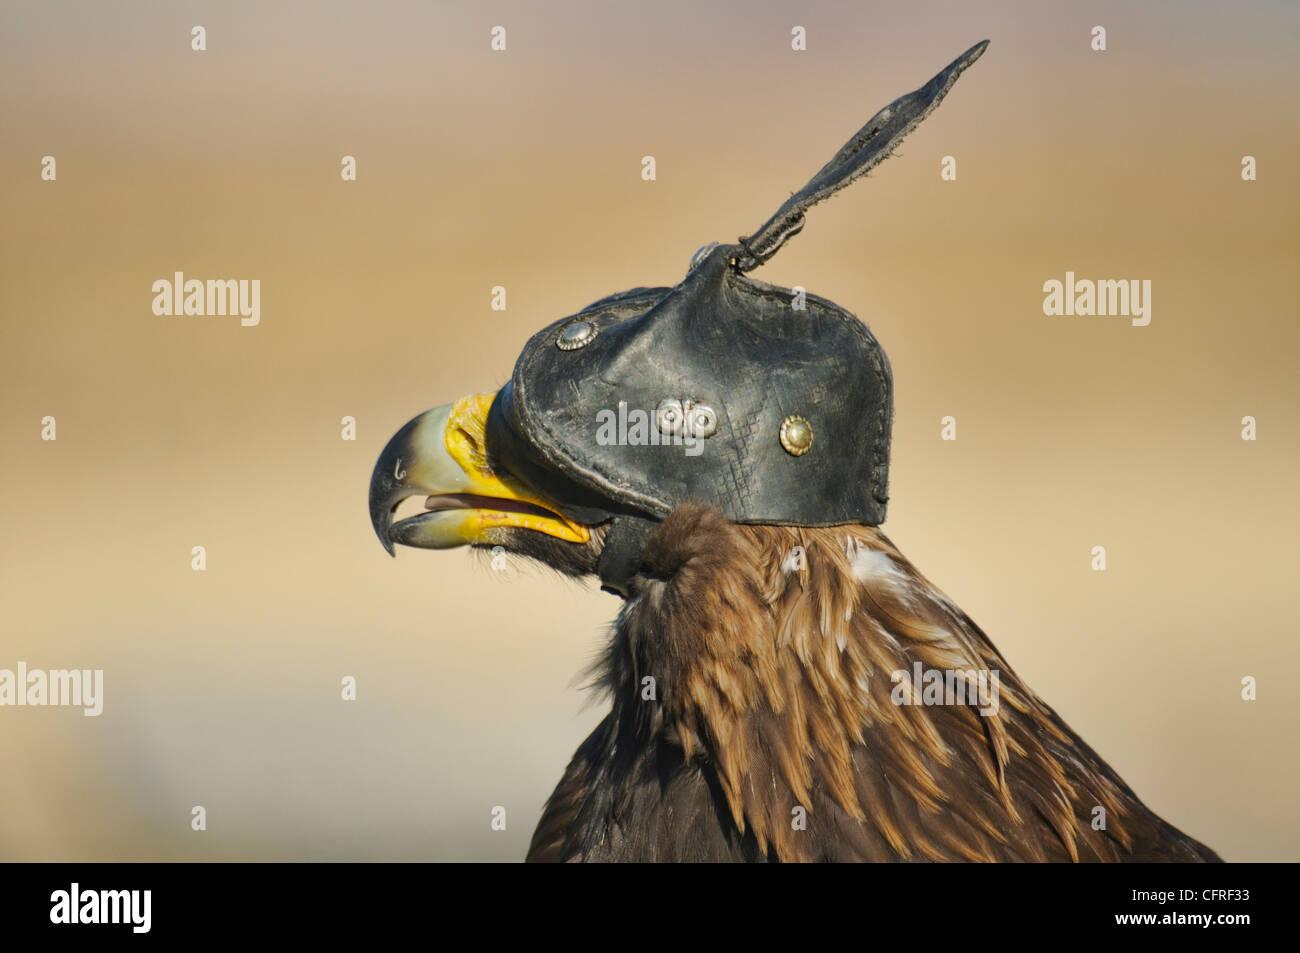 A Kazakh eagle hunter's golden eagle in the Altai Region of Bayan-Ölgii in Western Mongolia - Stock Image